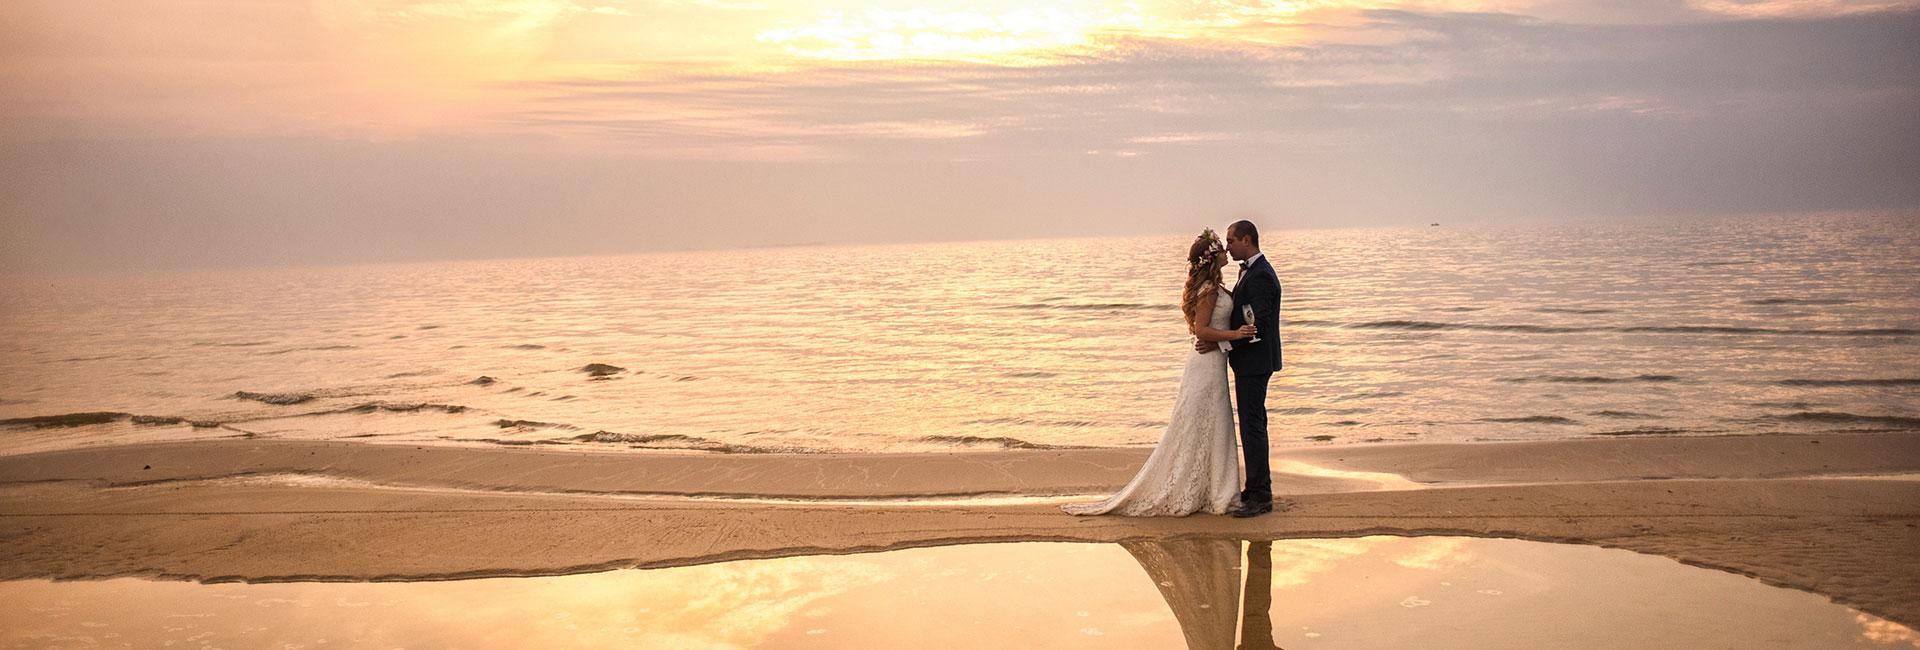 Optimizada the best places for a destination wedding